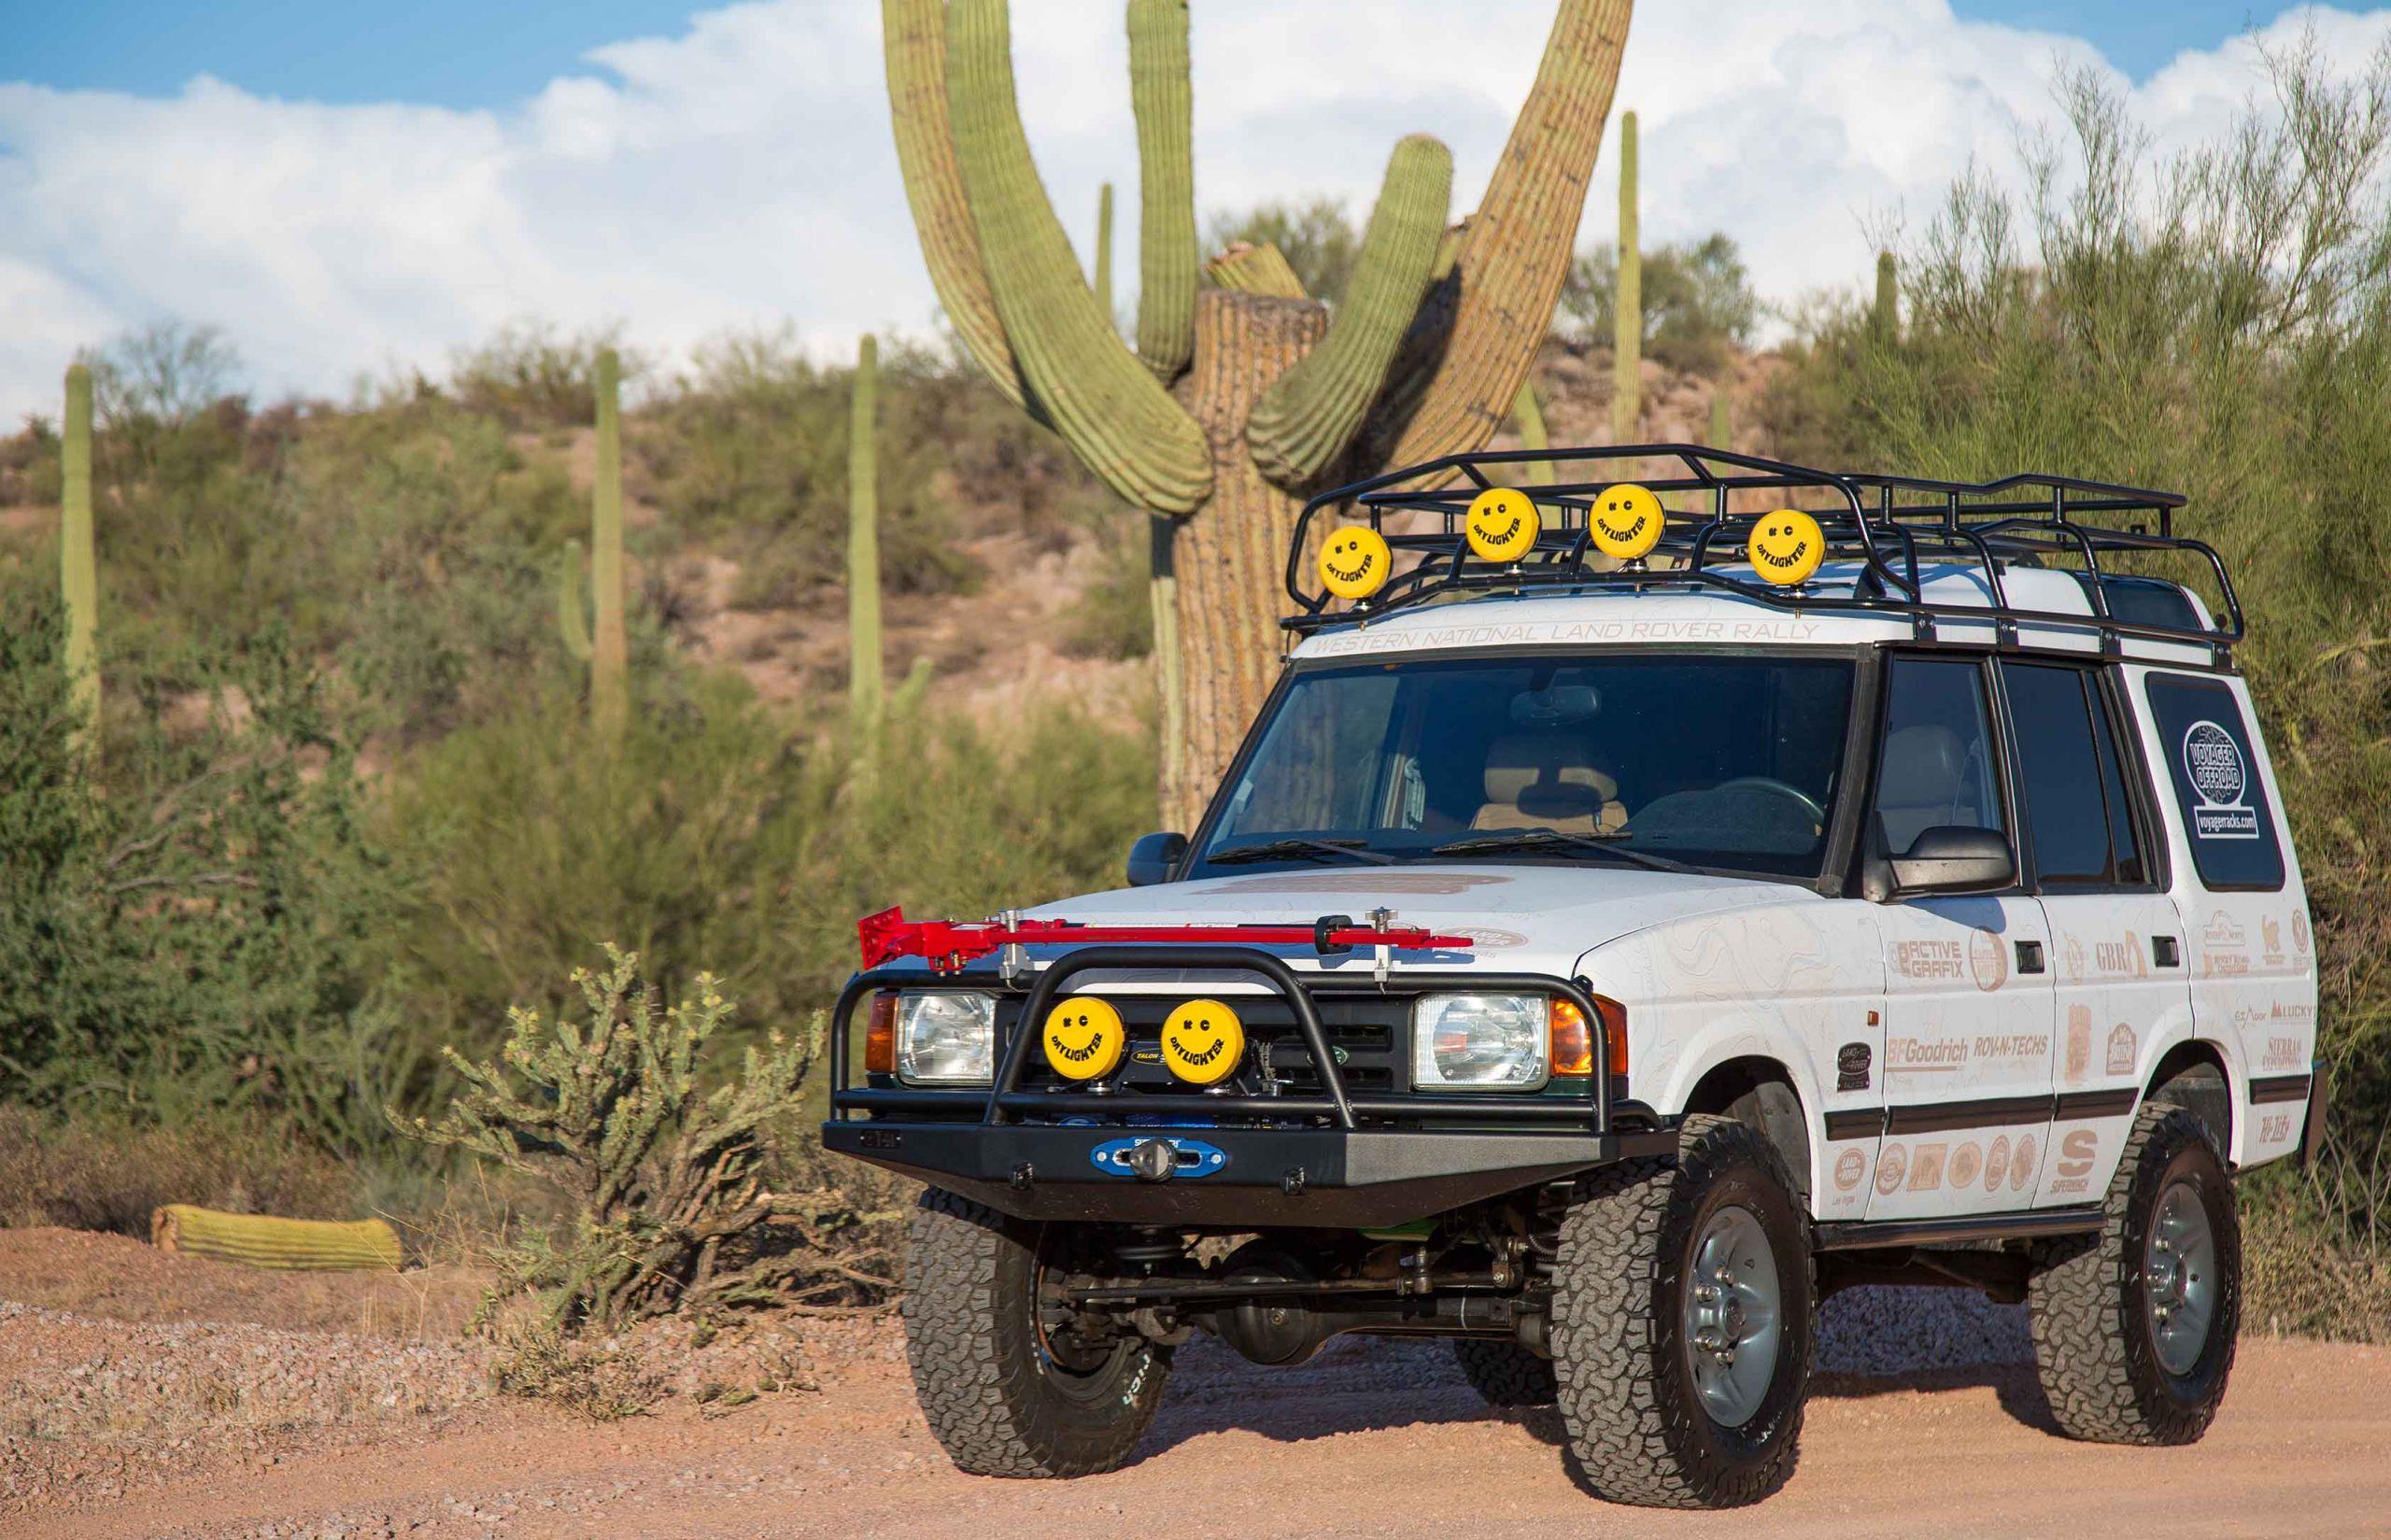 Custom Off Road / Overlanding Land Rover Build - Image #01